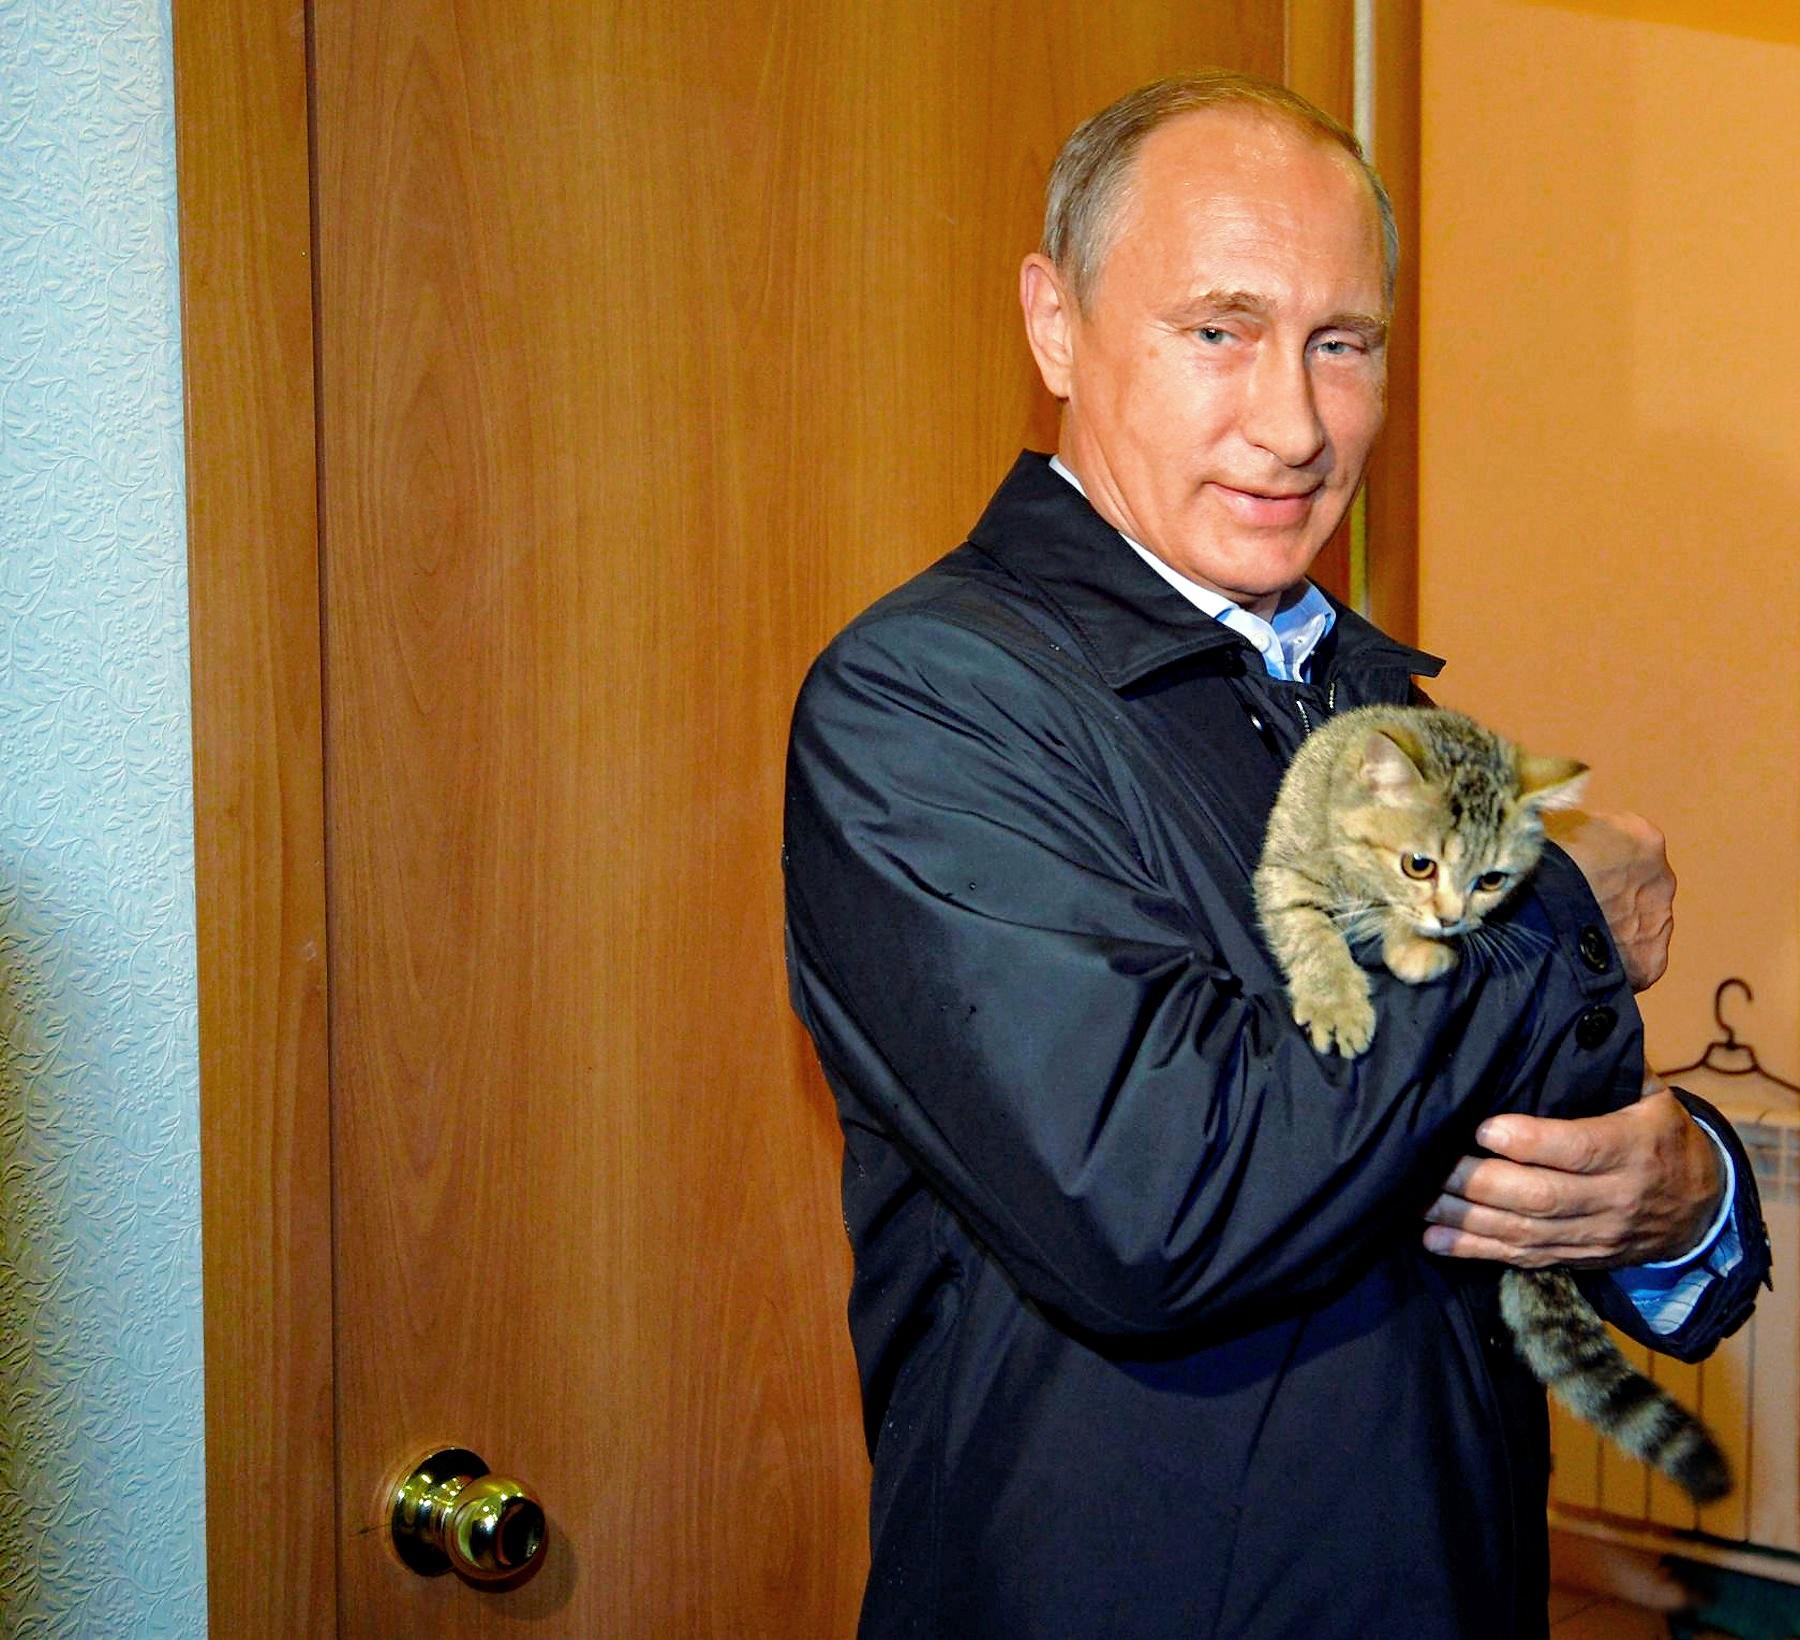 00-putin-with-cat-091016